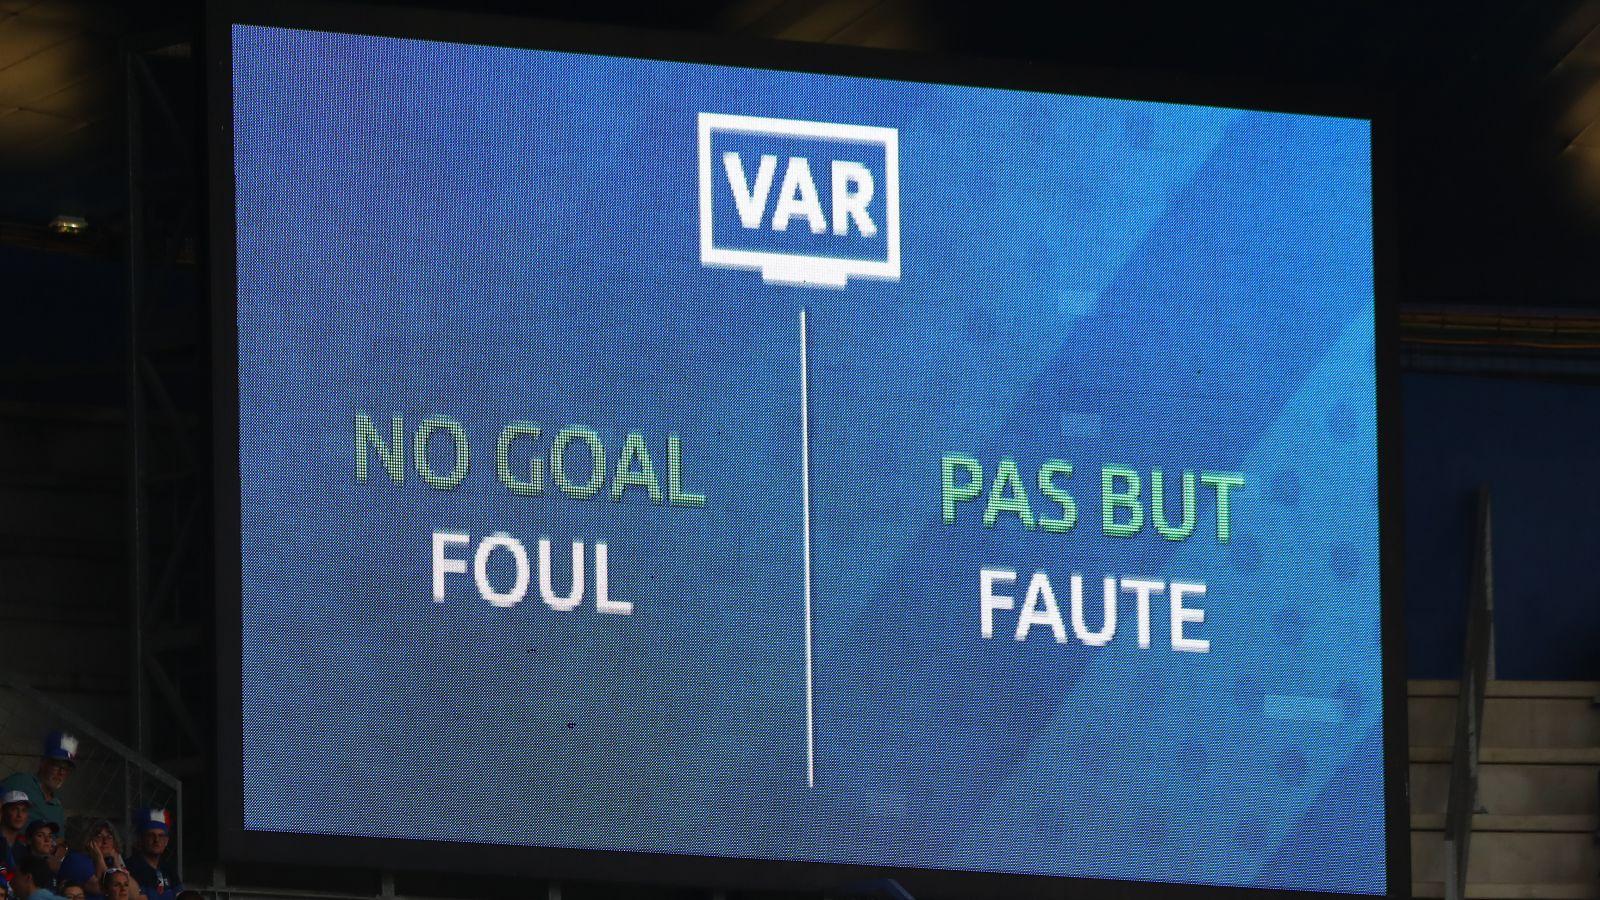 VAR makes Premier League less enjoyable, says fans' poll